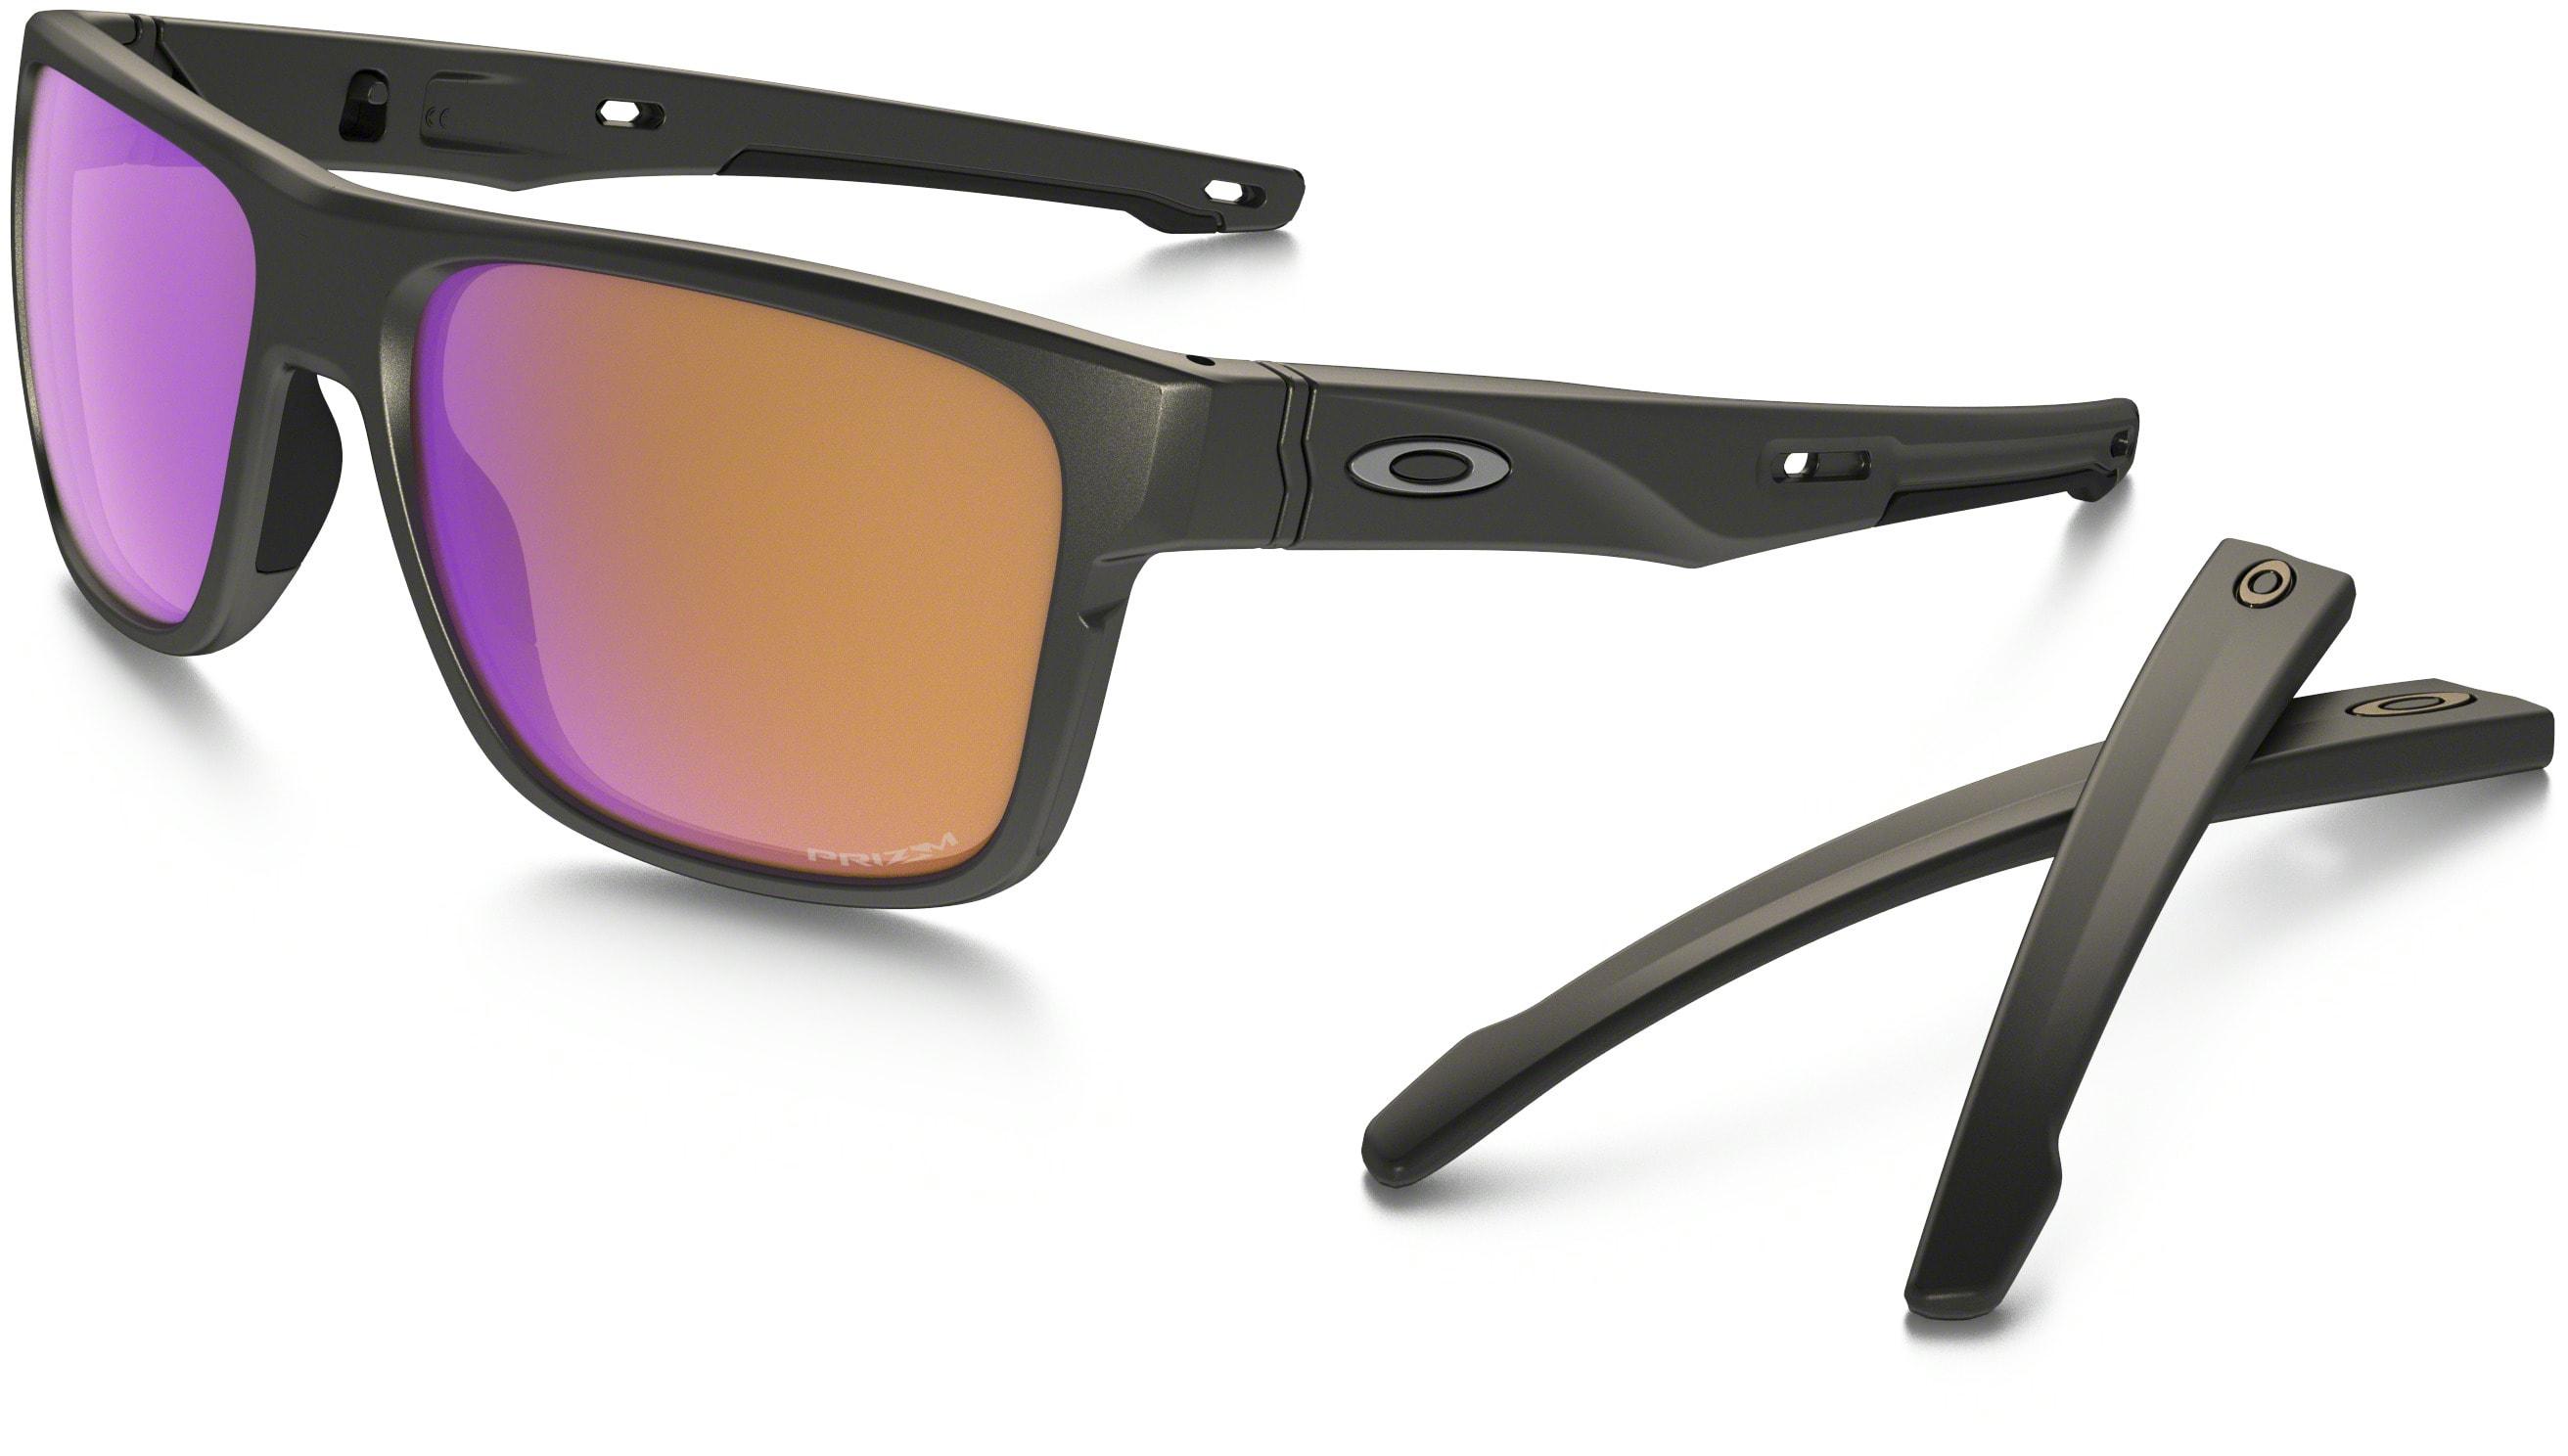 8d673b641b Oakley Crossrange Sunglasses - thumbnail 1